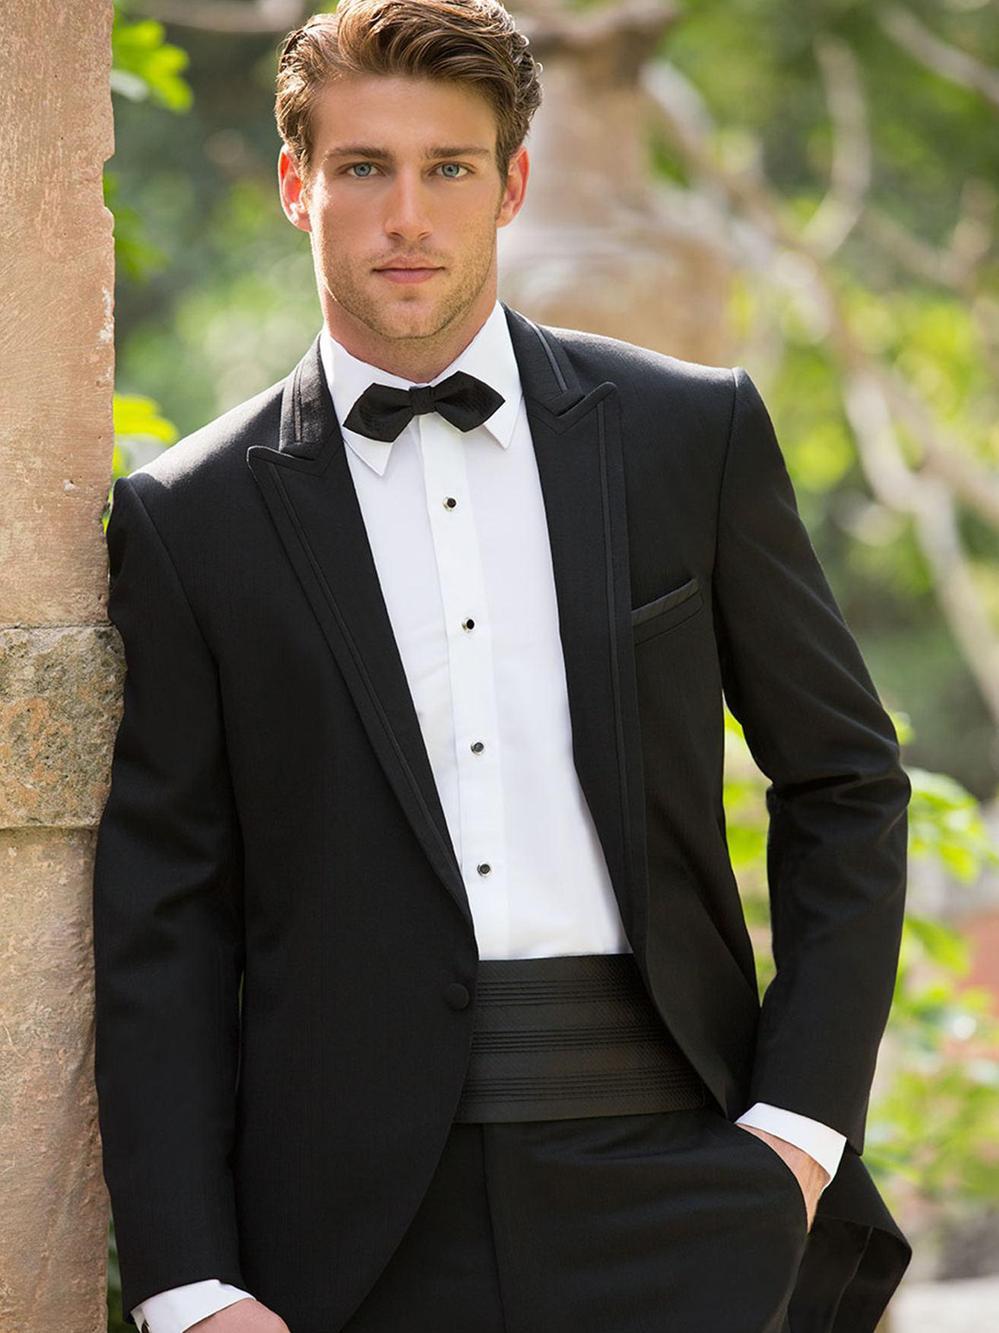 Wedding Mens Wedding Tuxedos camouflage wedding tuxedo modern fit tuxedos groom ocodea